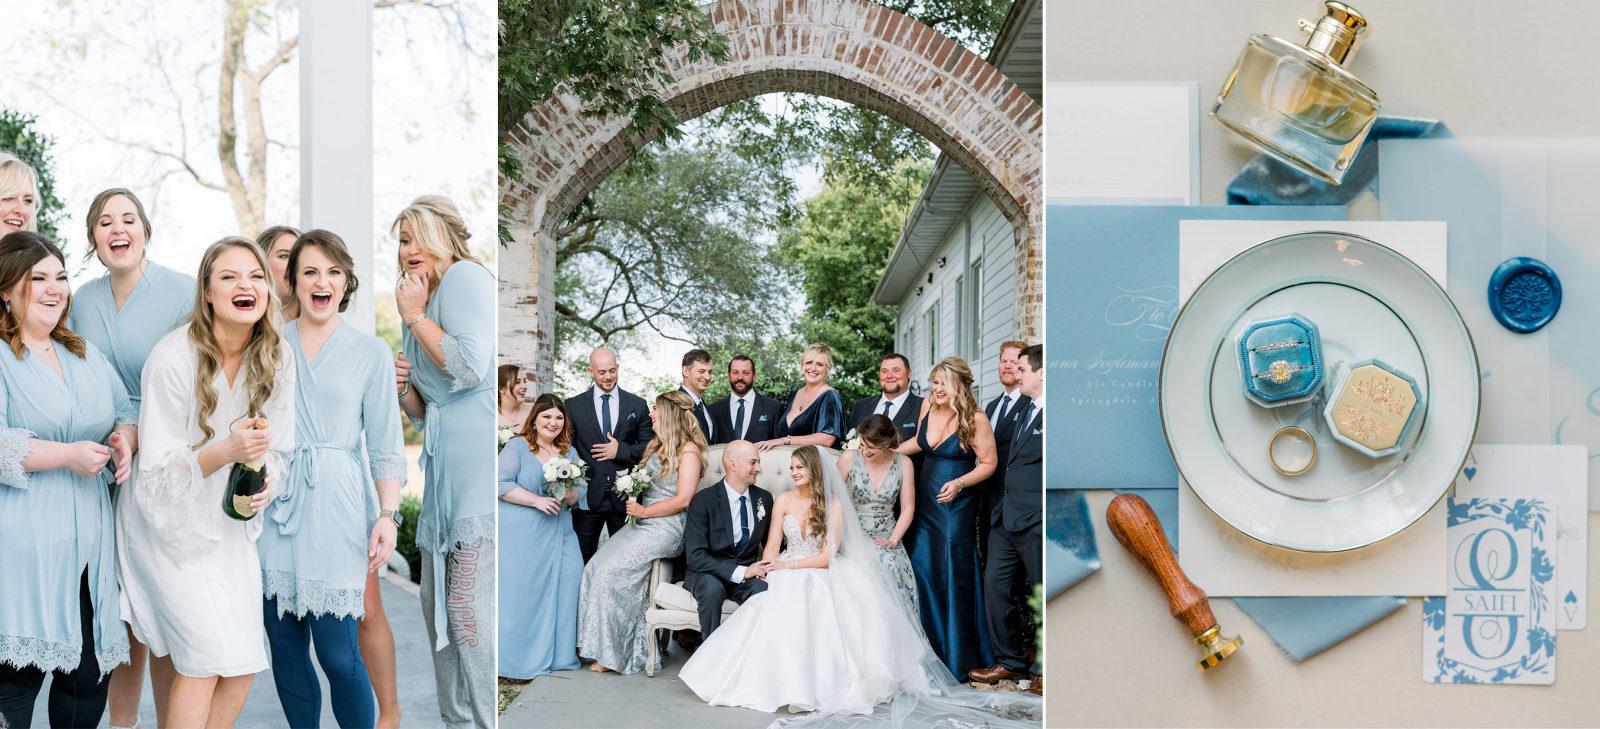 best northwest arkansas wedding photographer